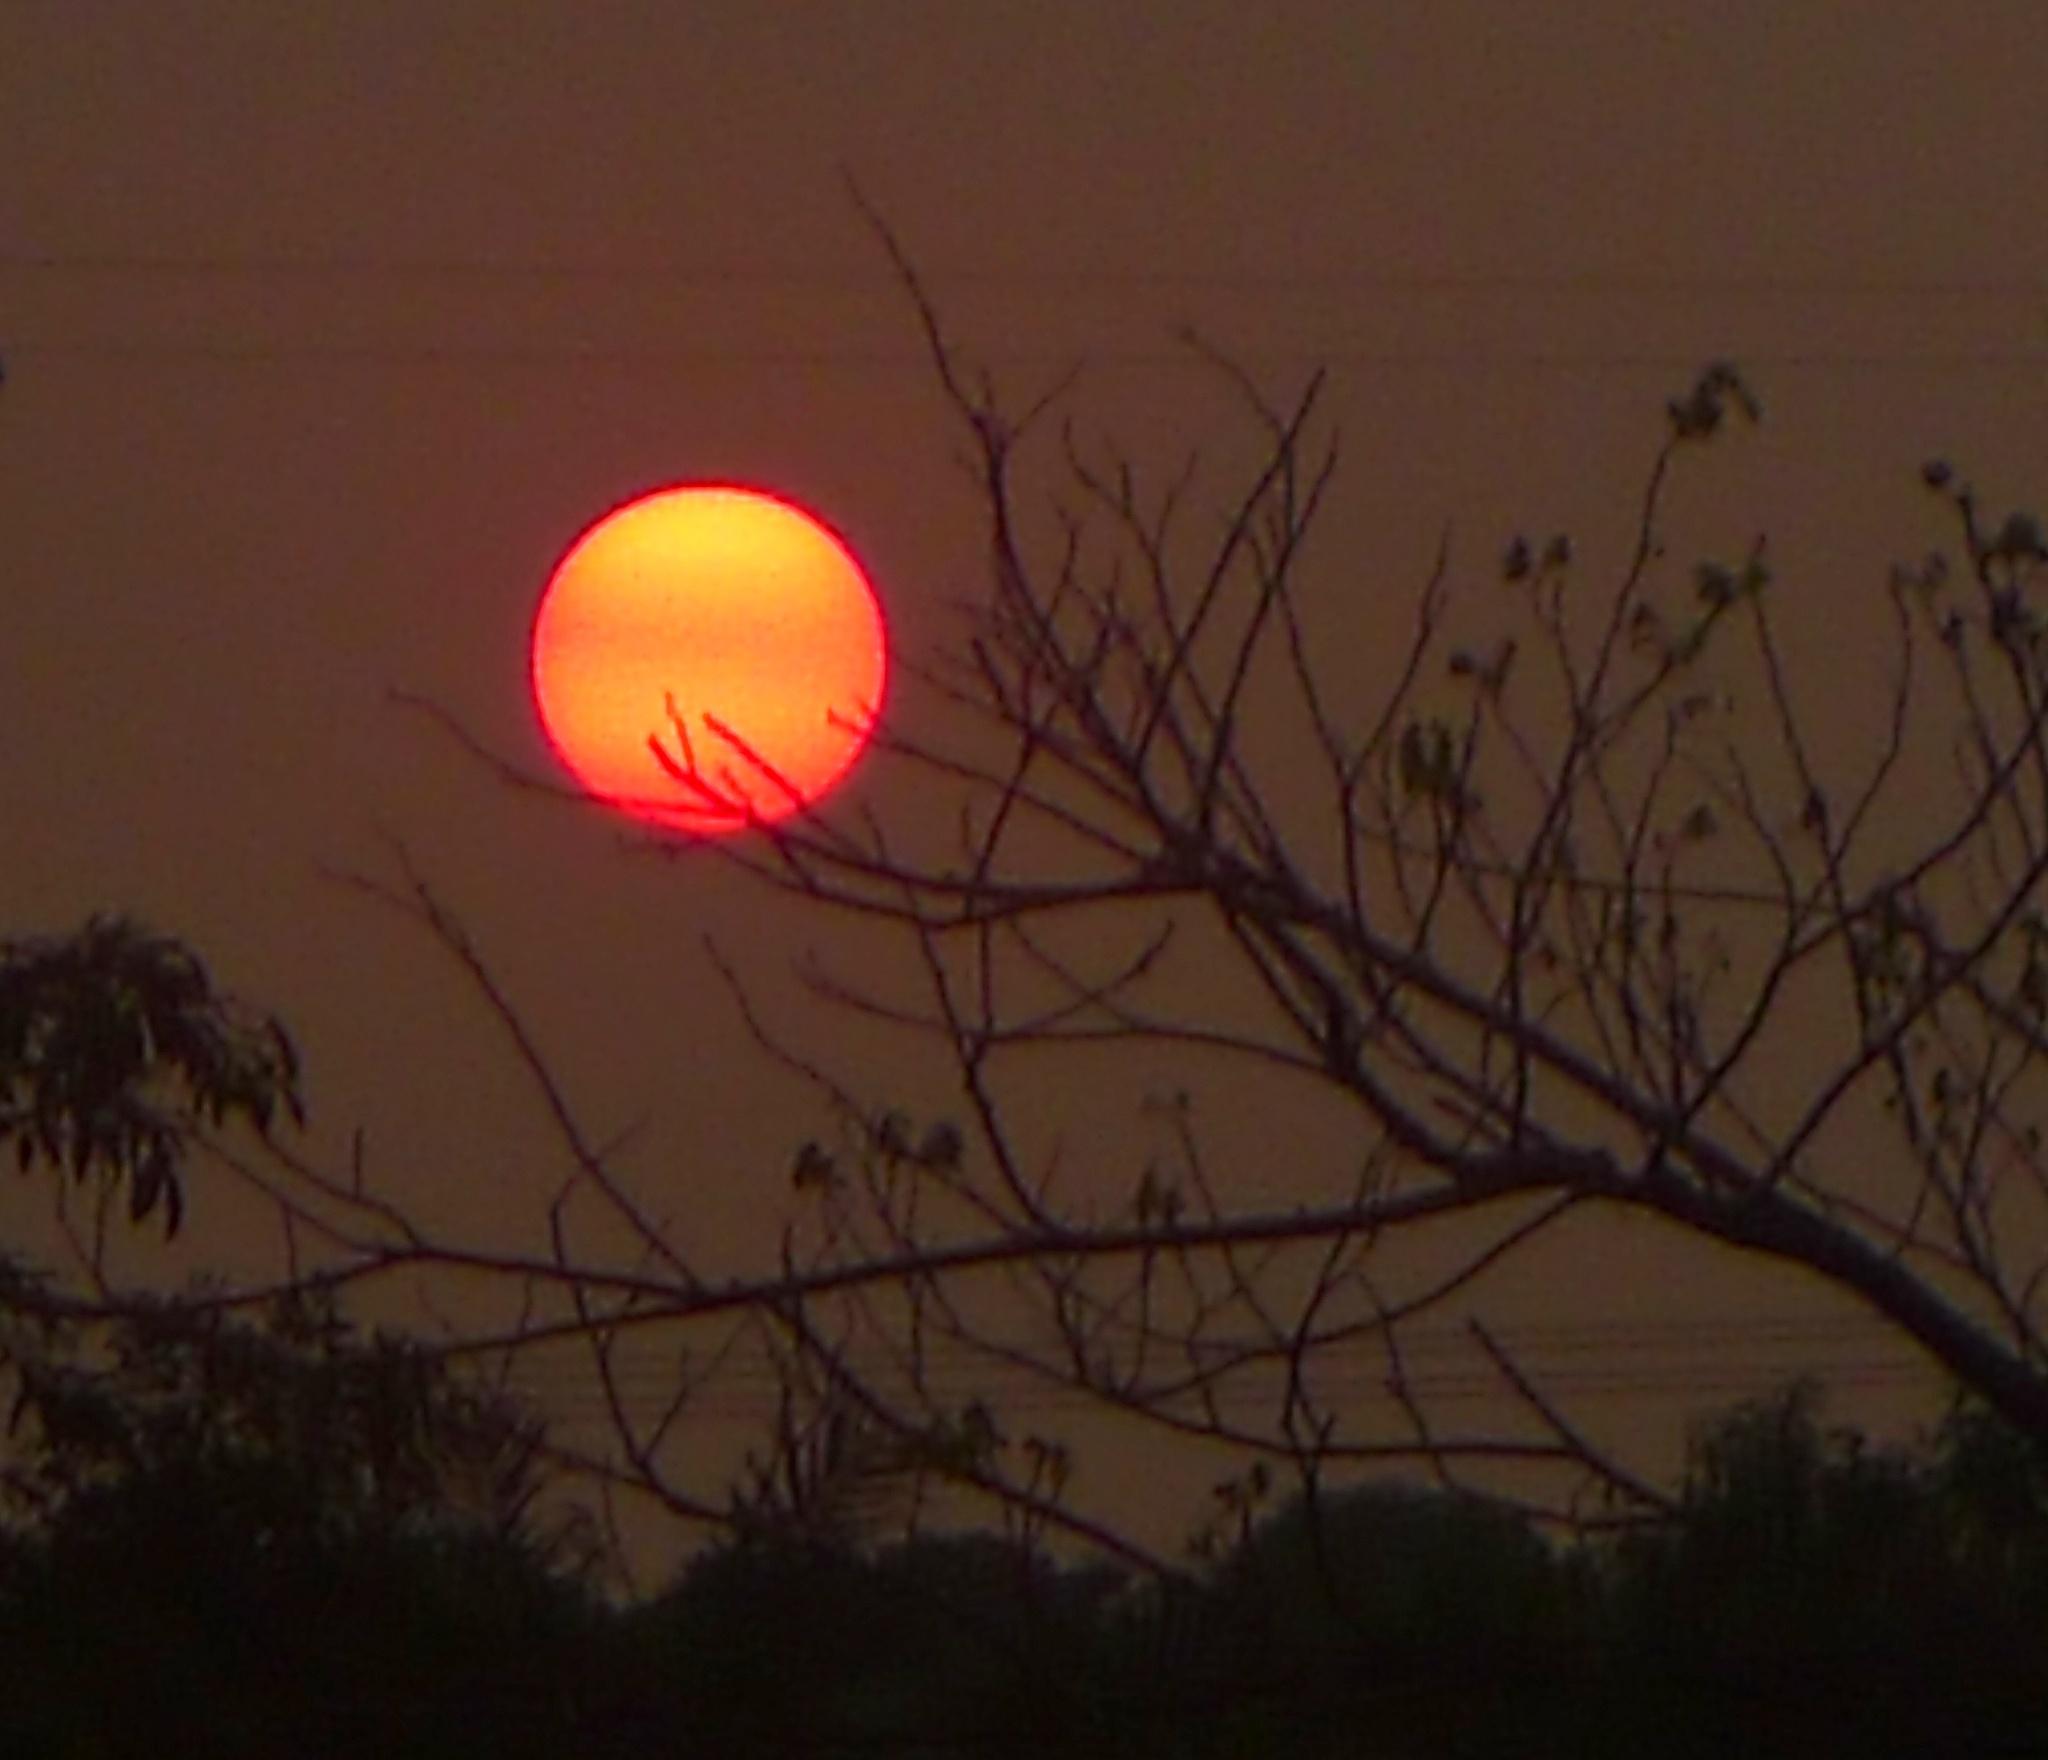 SUN AT THE EQUATOR by Adib Noh